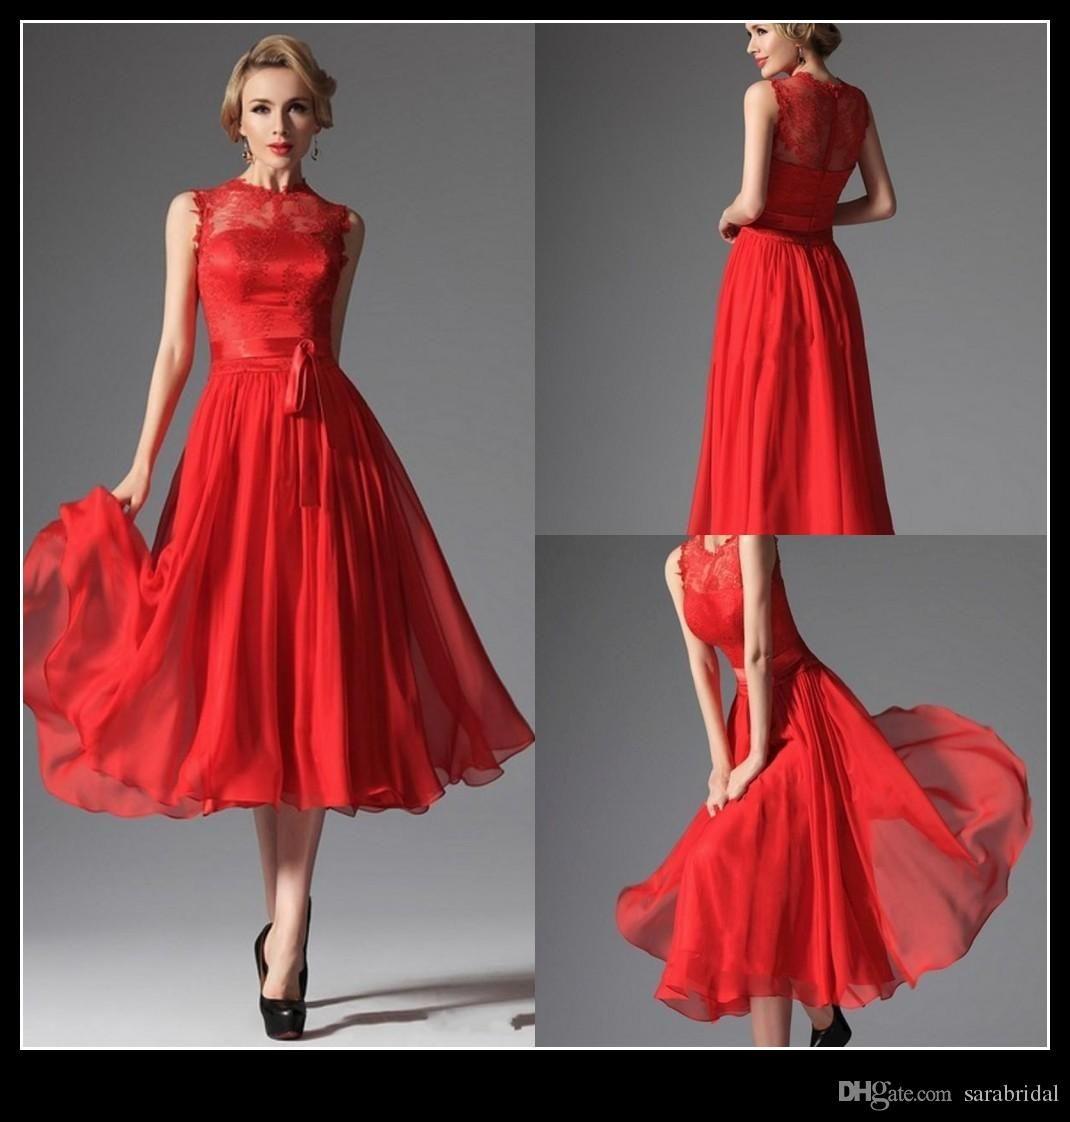 Charming Tea Length Bridesmaid Dress 2016 Lace Chiffon A Line Red Wedding Party Junior Maid